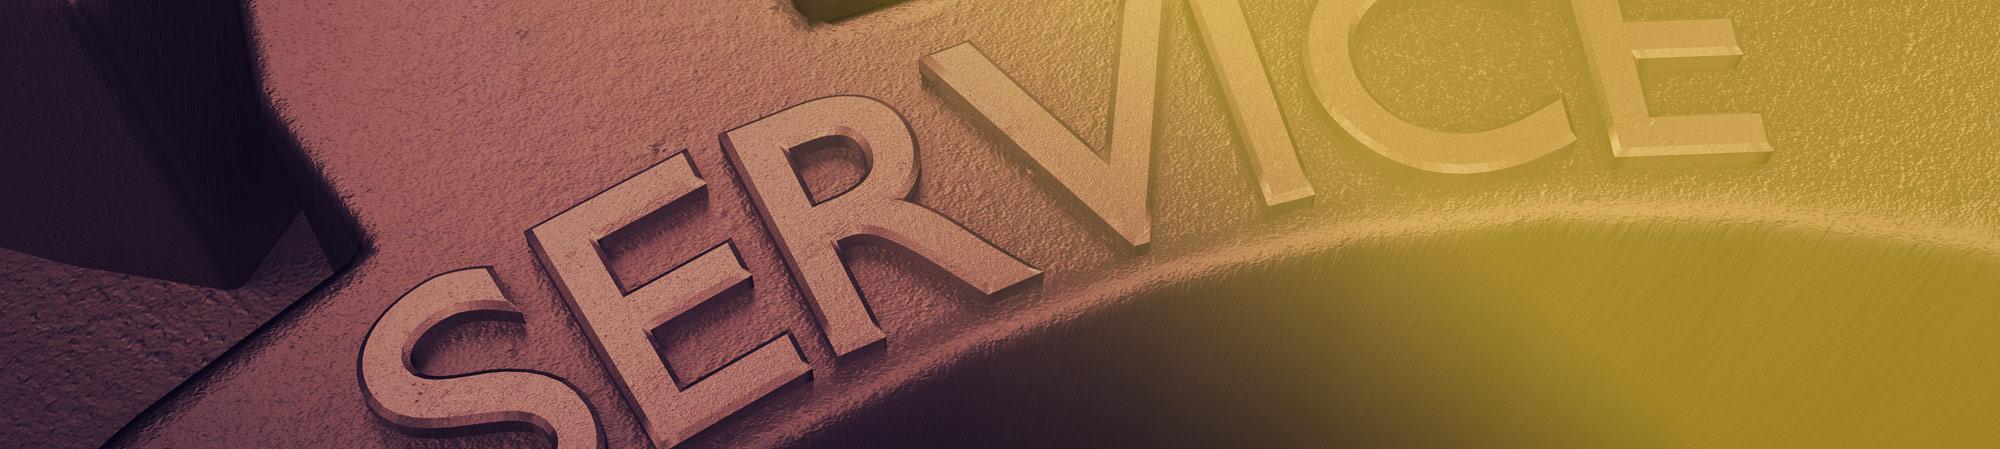 hight resolution of rv service